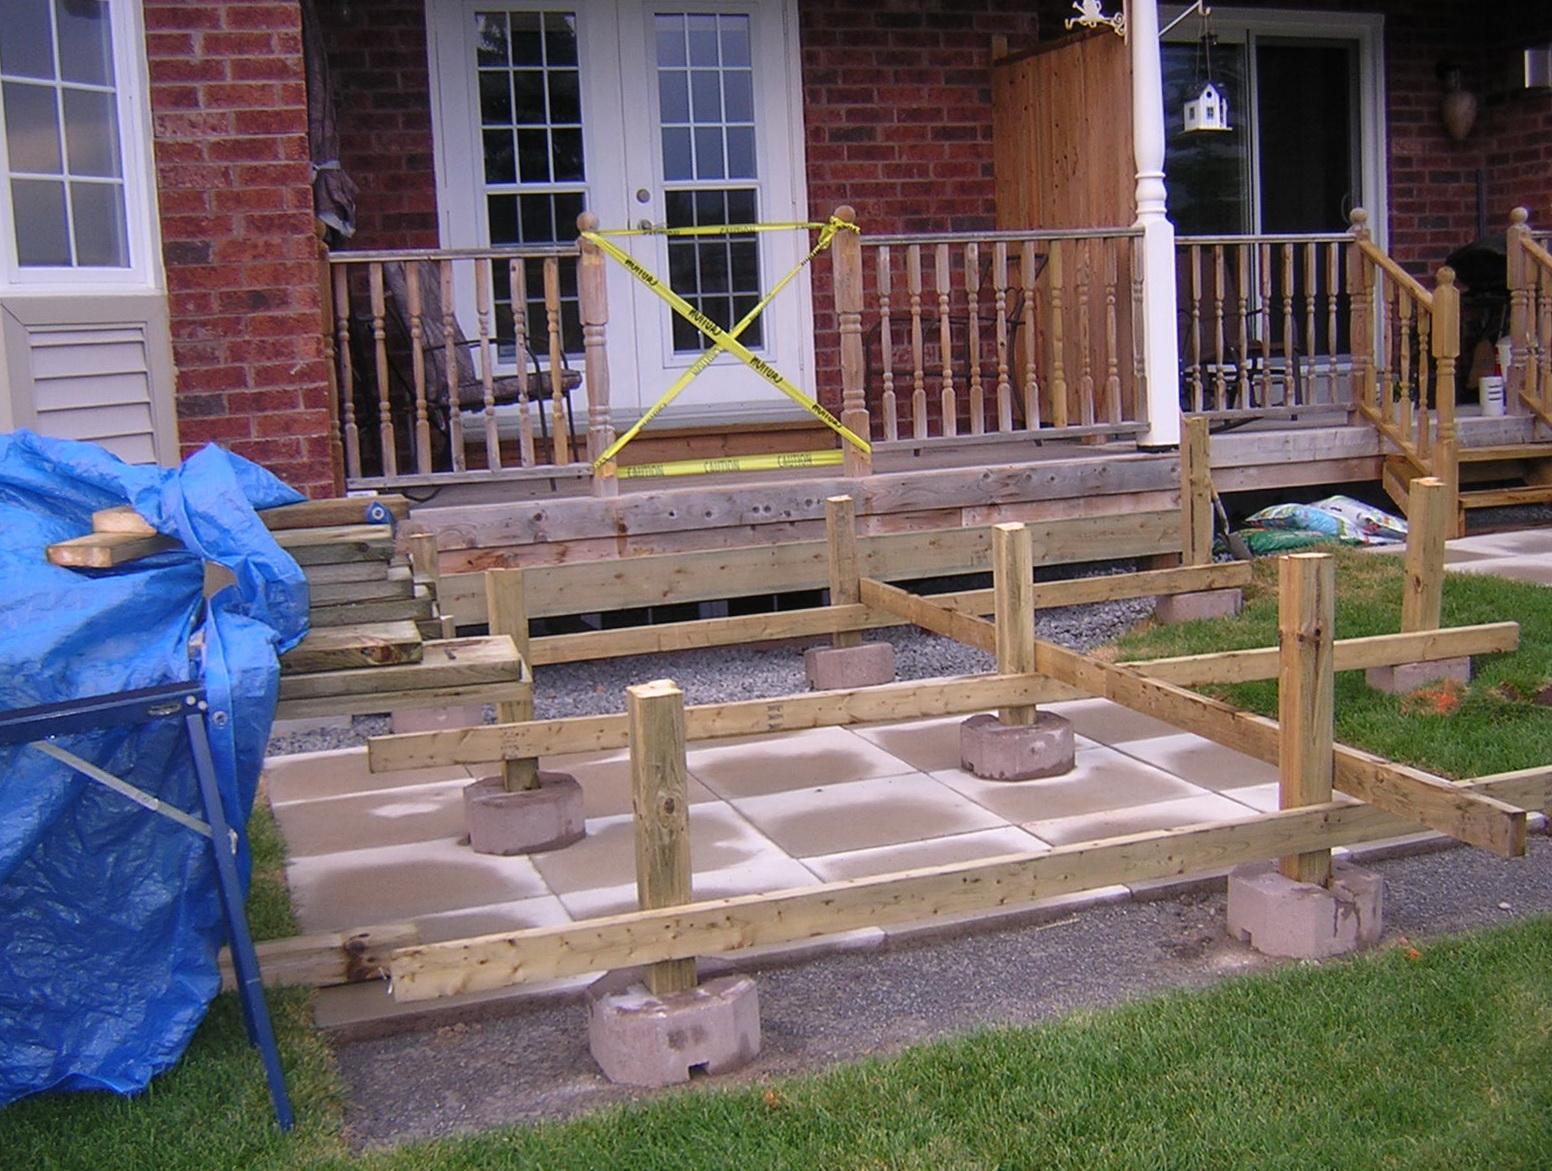 Building A Wood Deck On Top Of A Concrete Patio - Closet ...